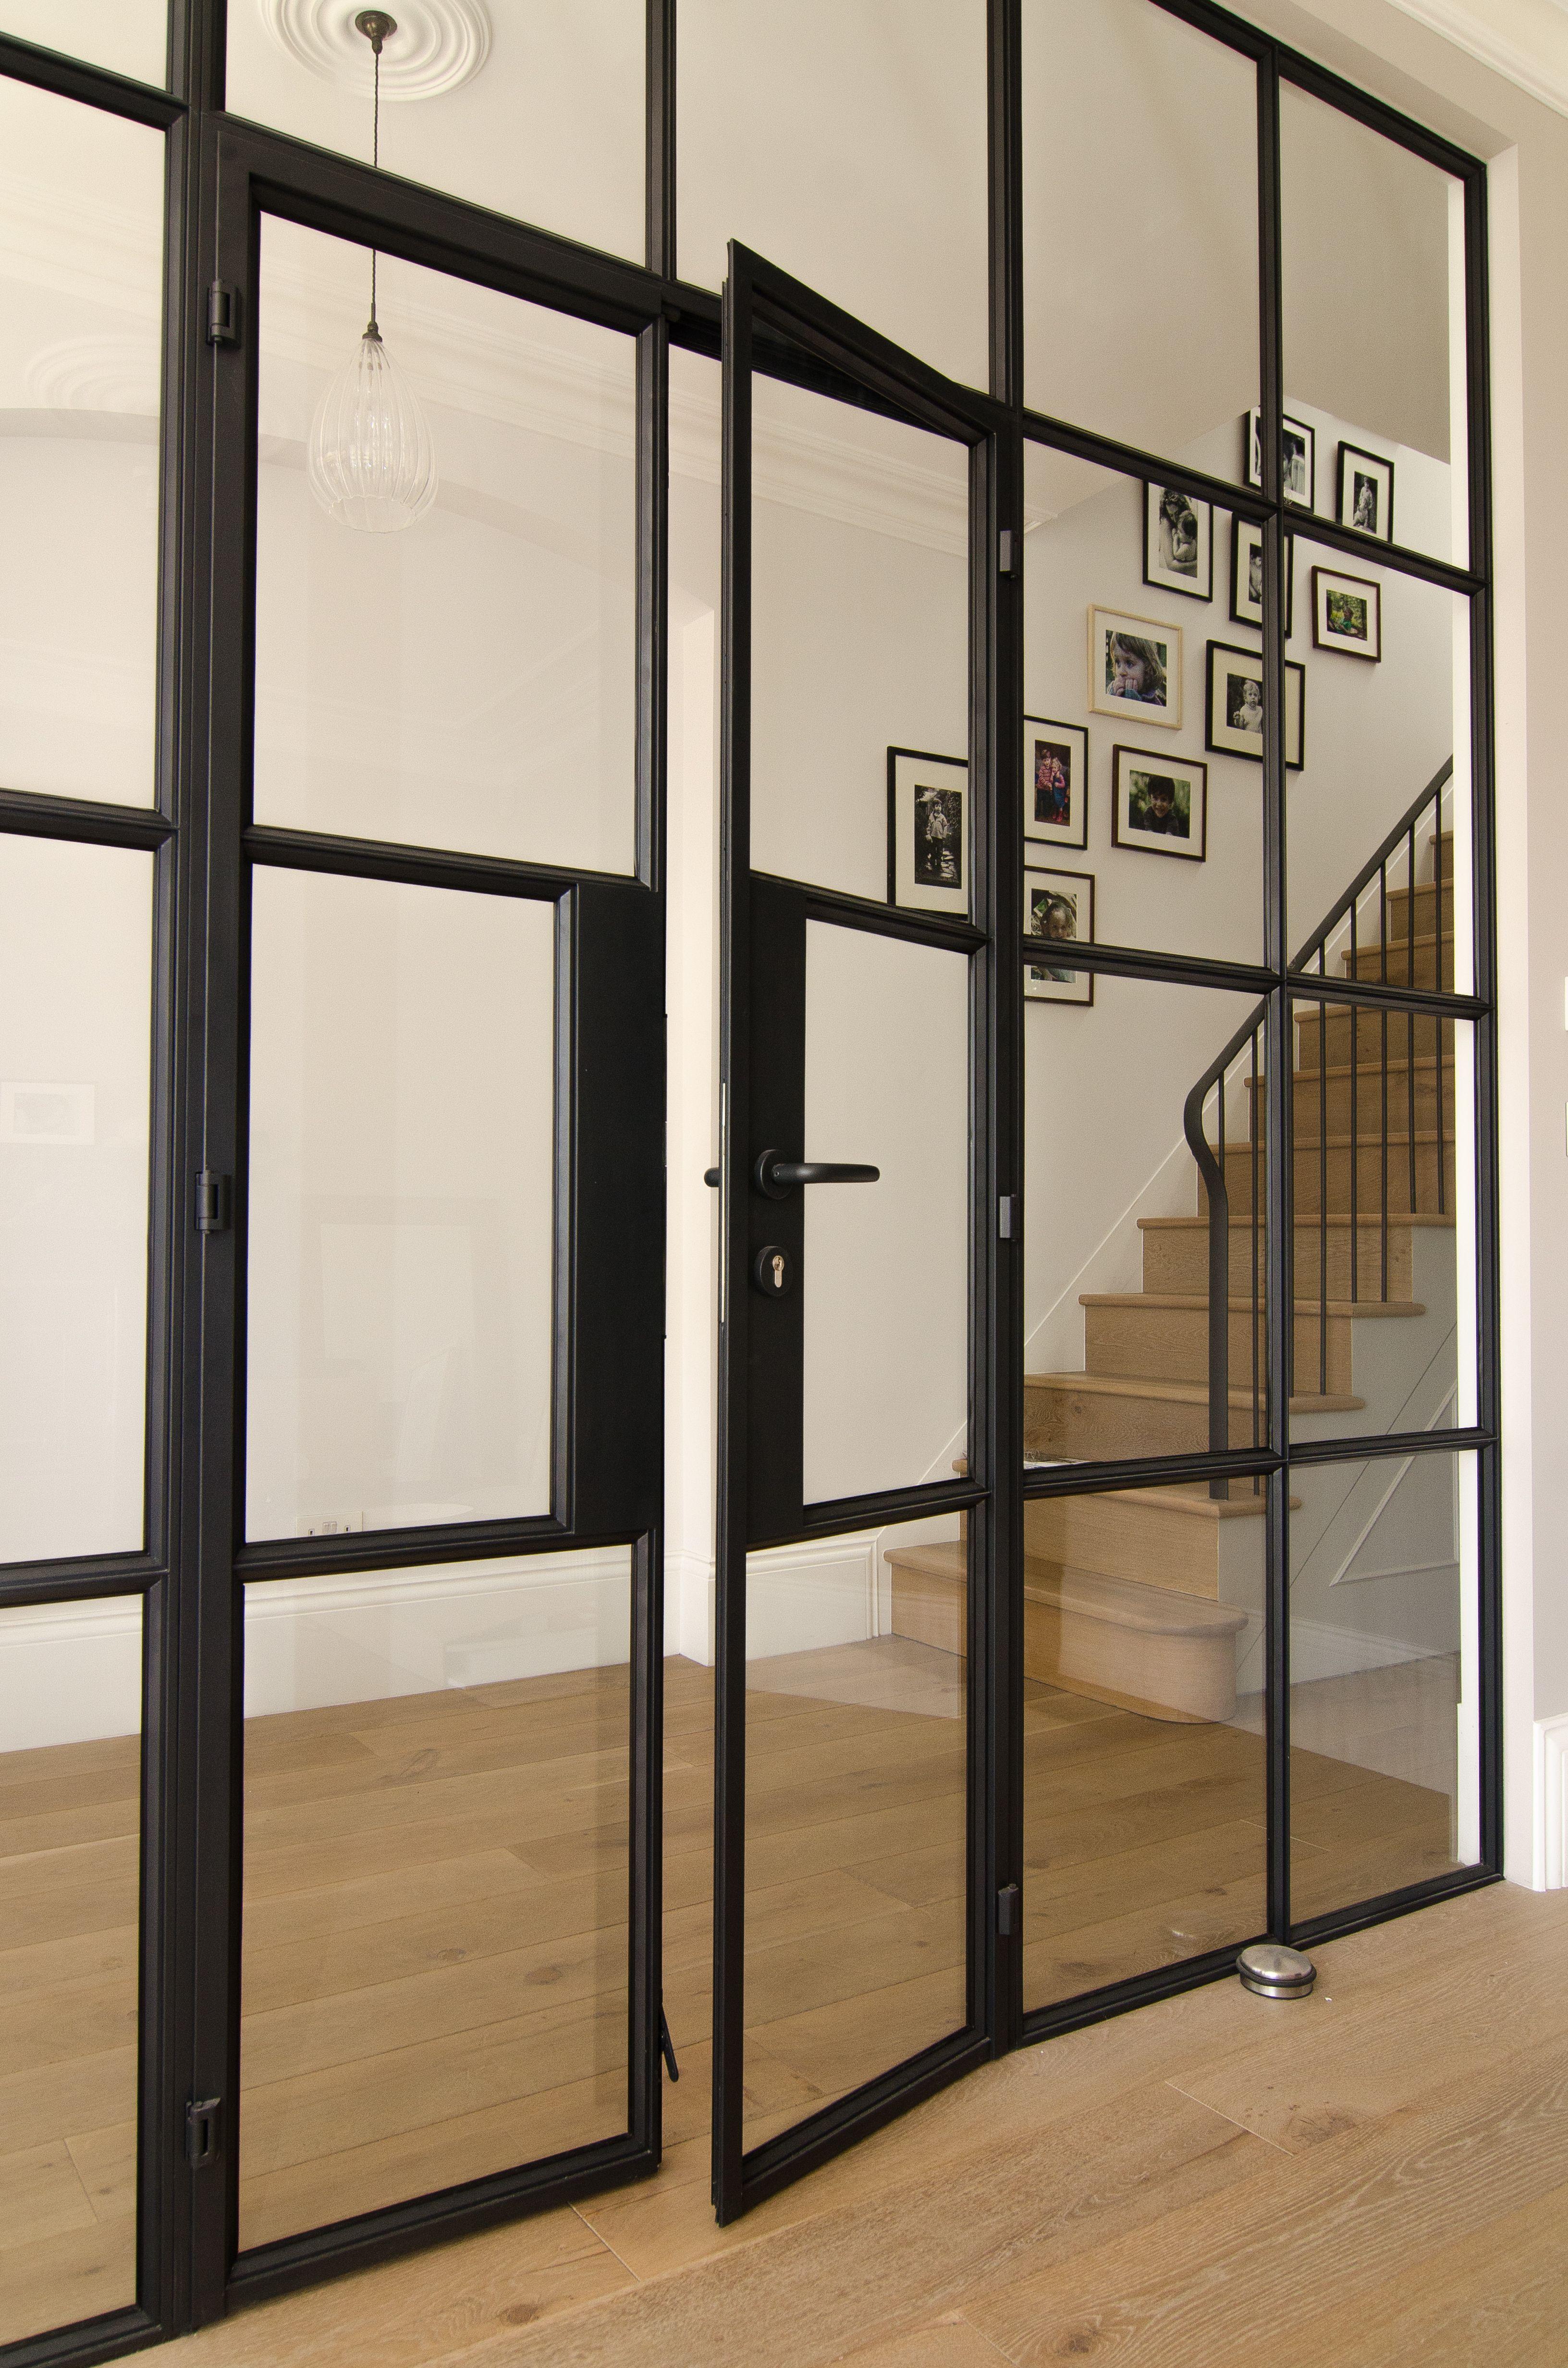 Crittal Style Steel Internal Door Internal Glass Doors Glass Doors Interior Exterior Doors With Glass